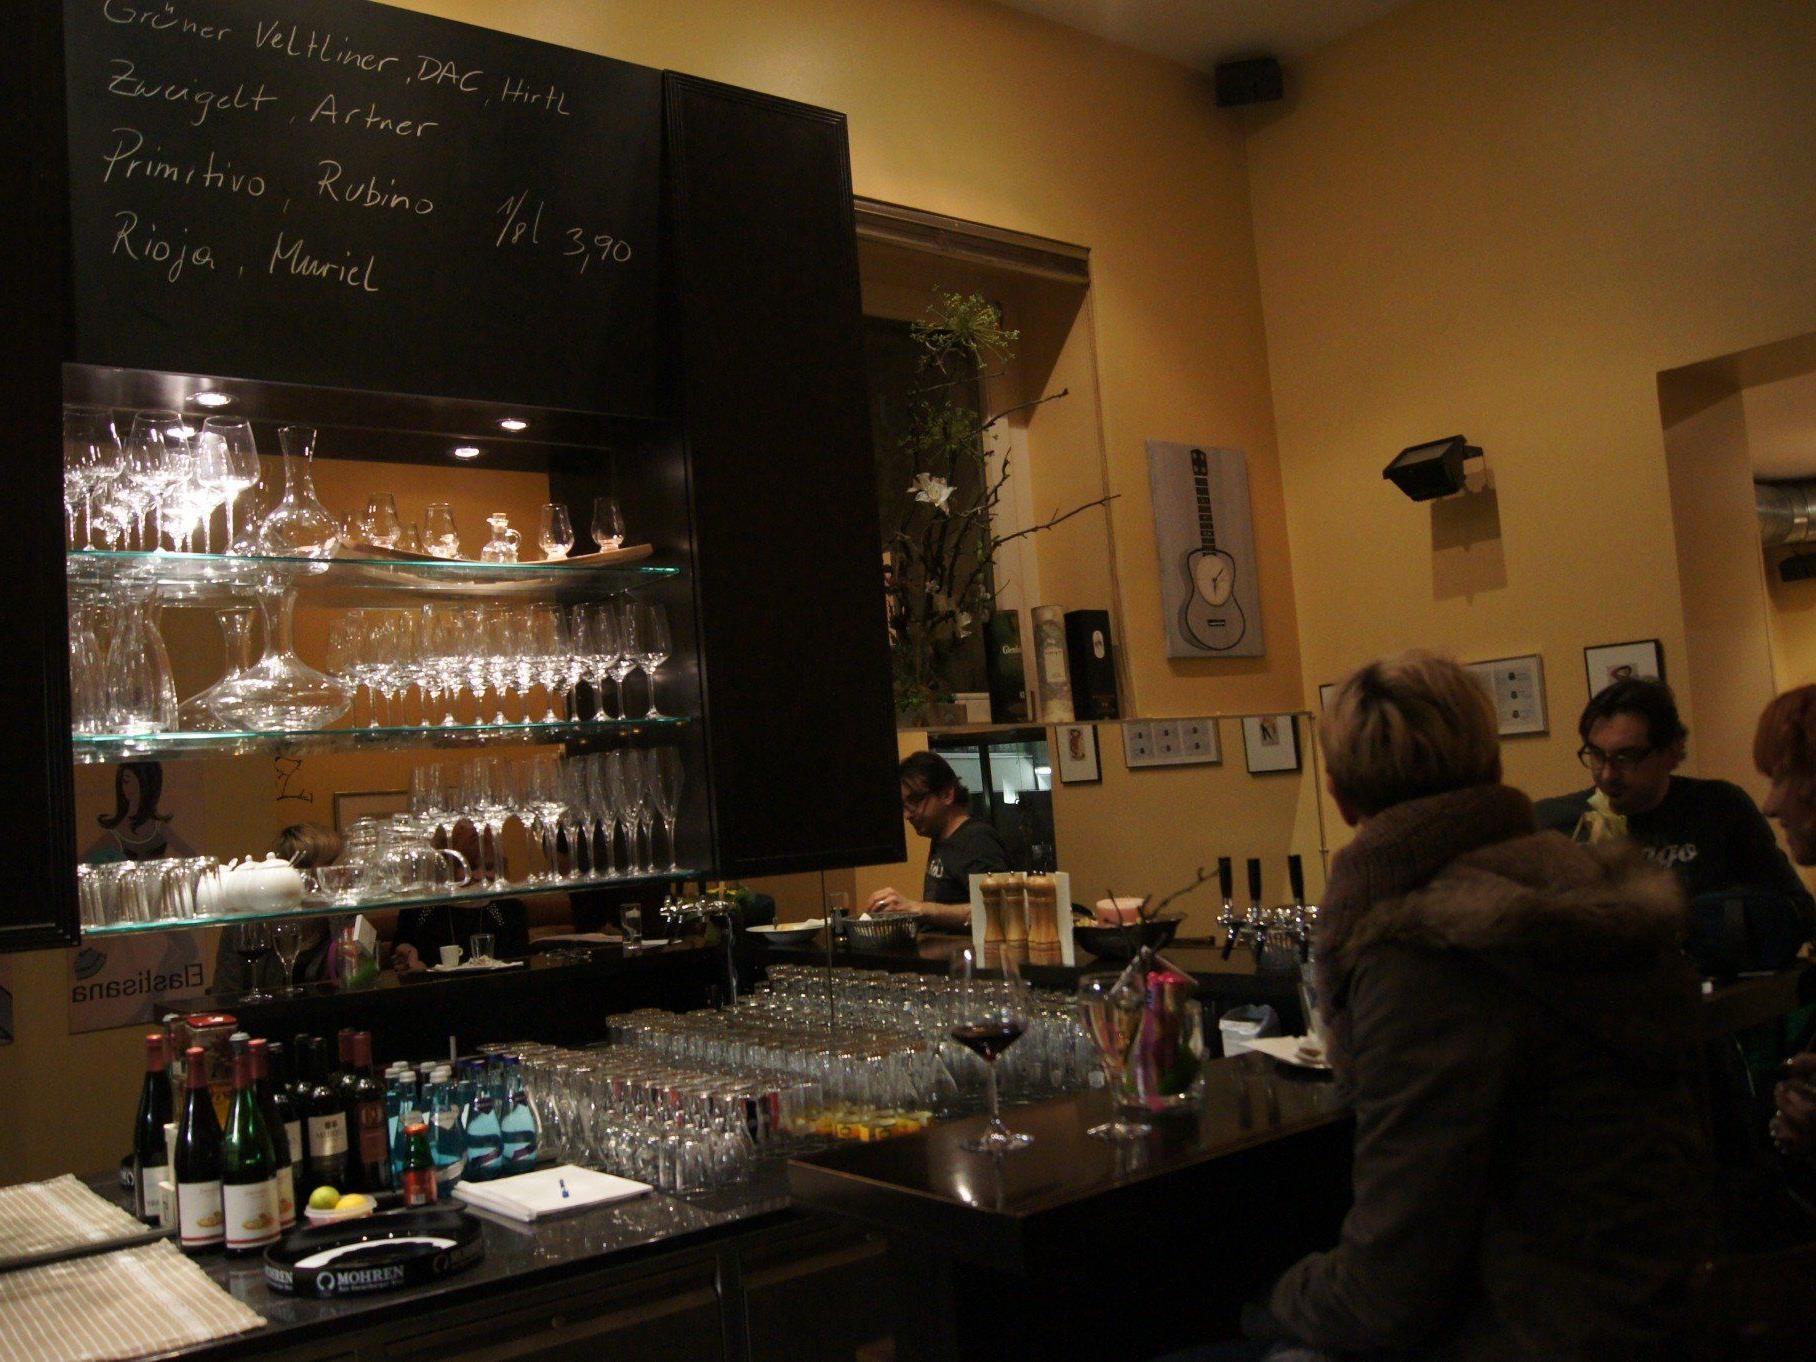 Gemütliche Atmosphäre im Café Elastisana.